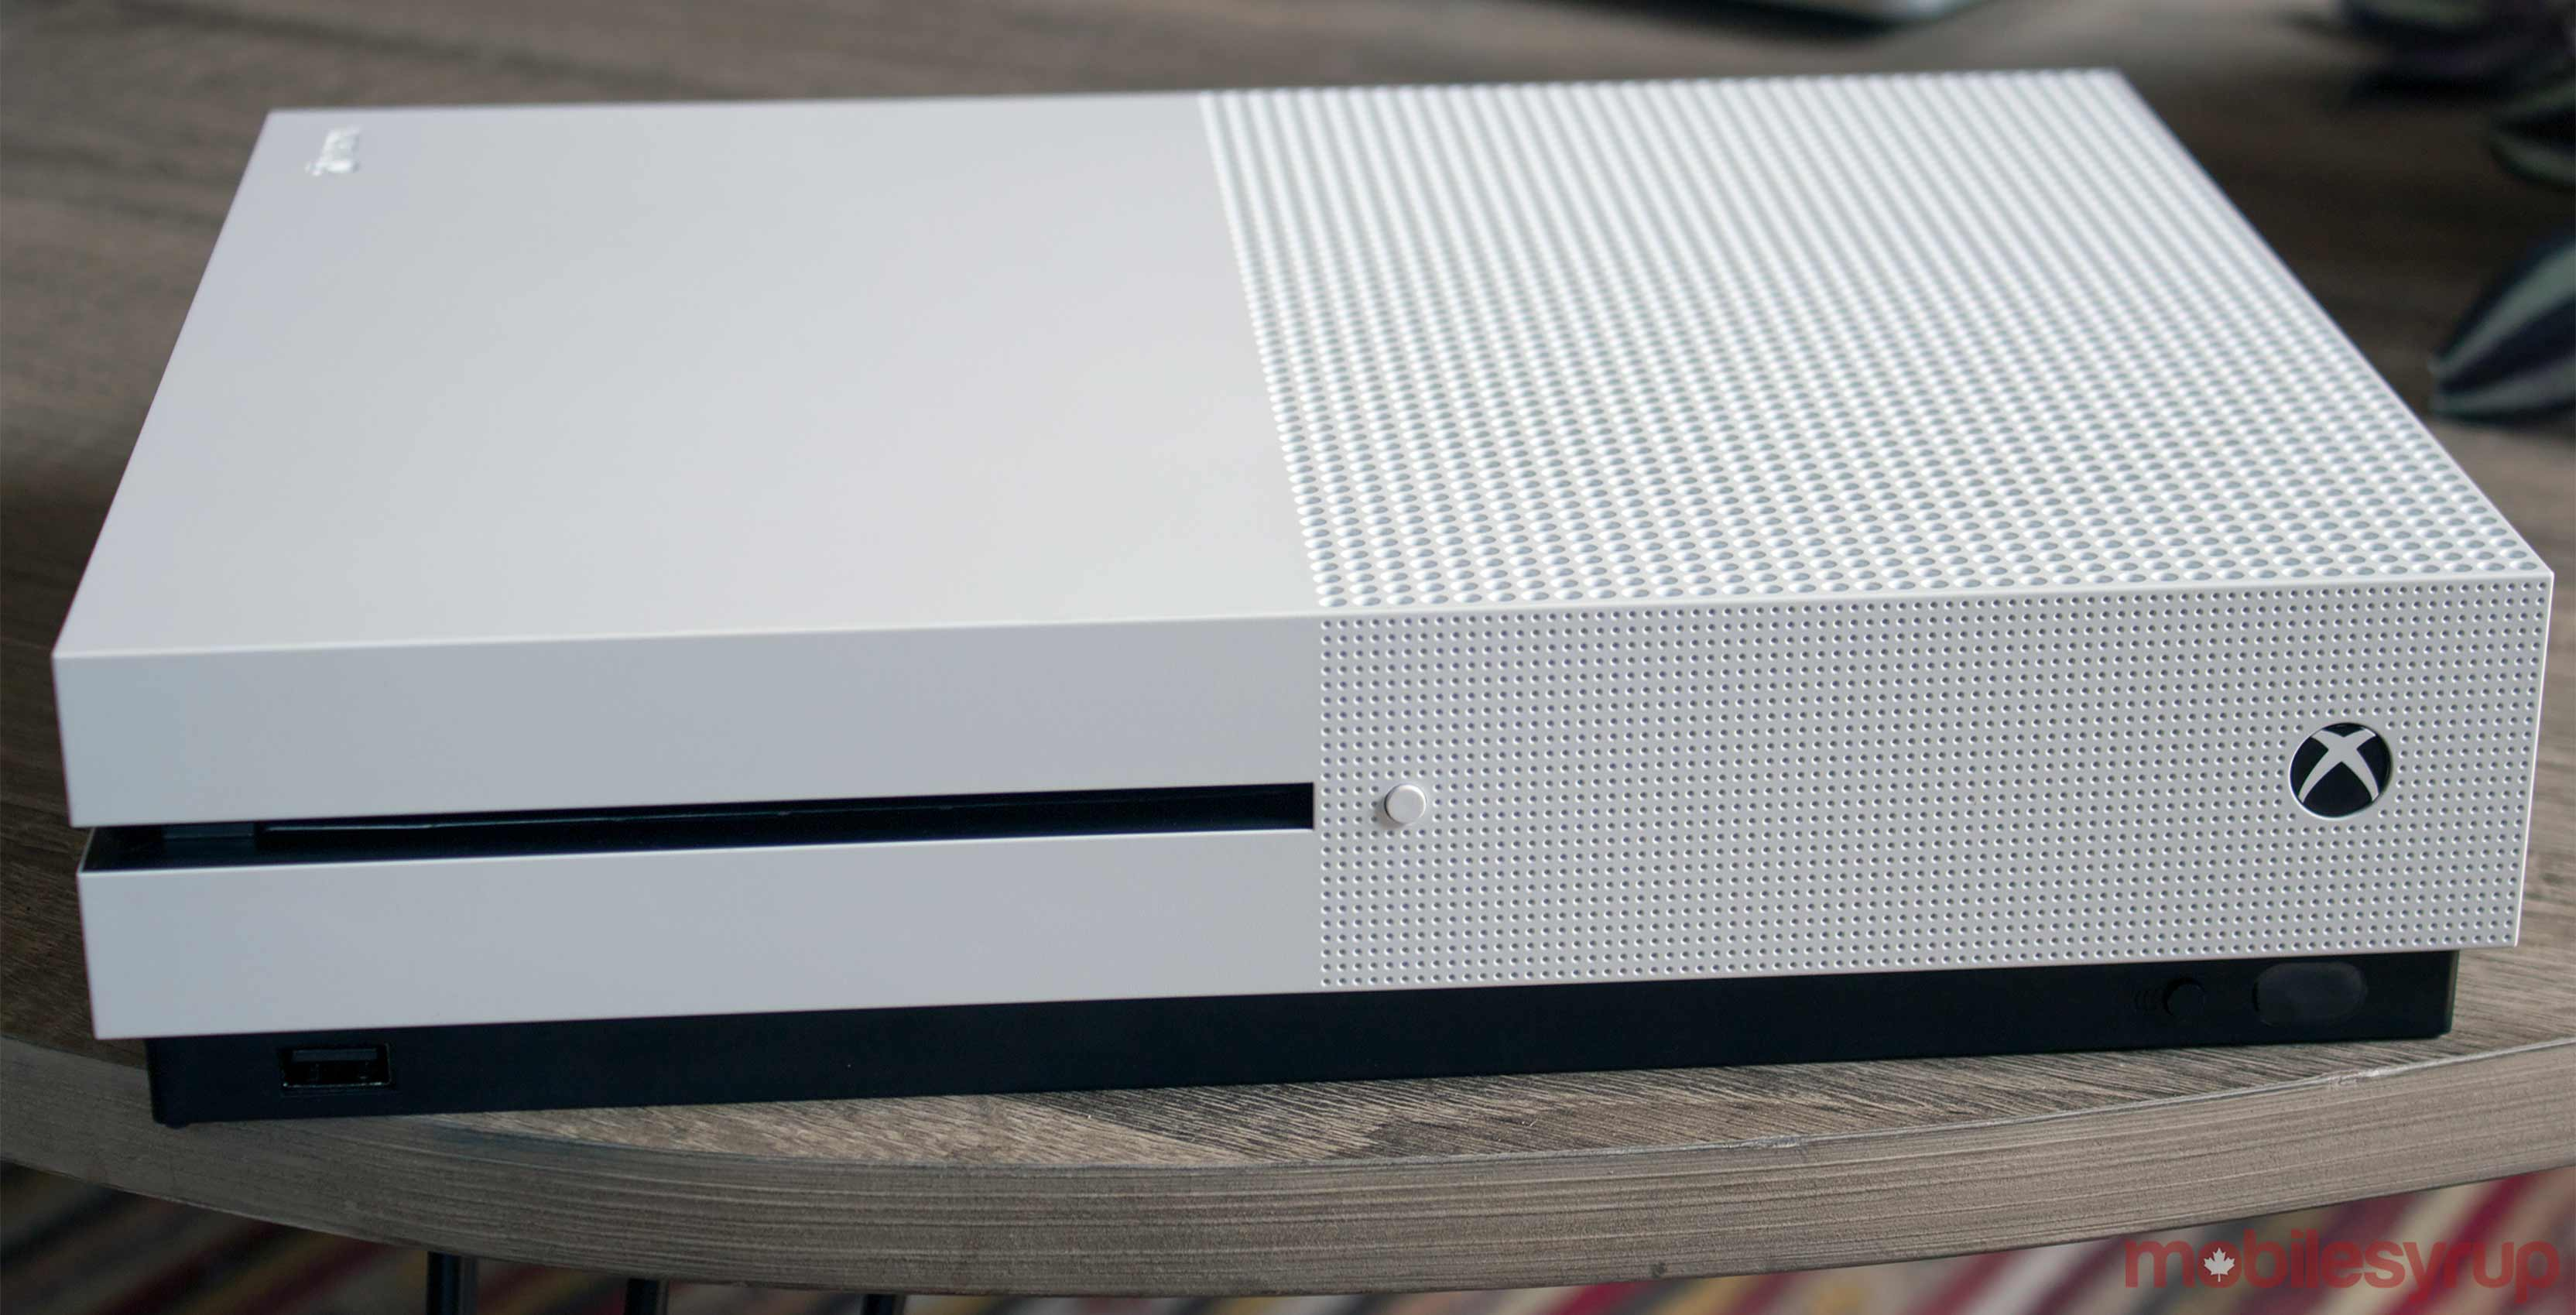 The white Xbox One S